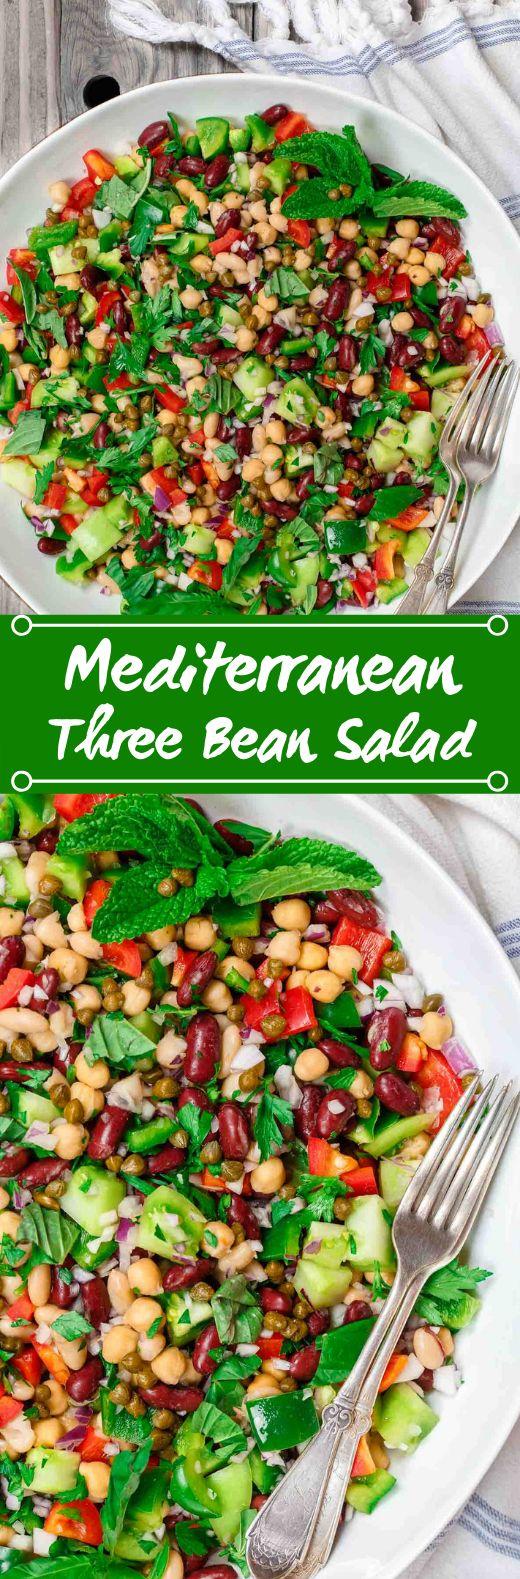 Mediterranean Three Bean Salad #vegan #salad